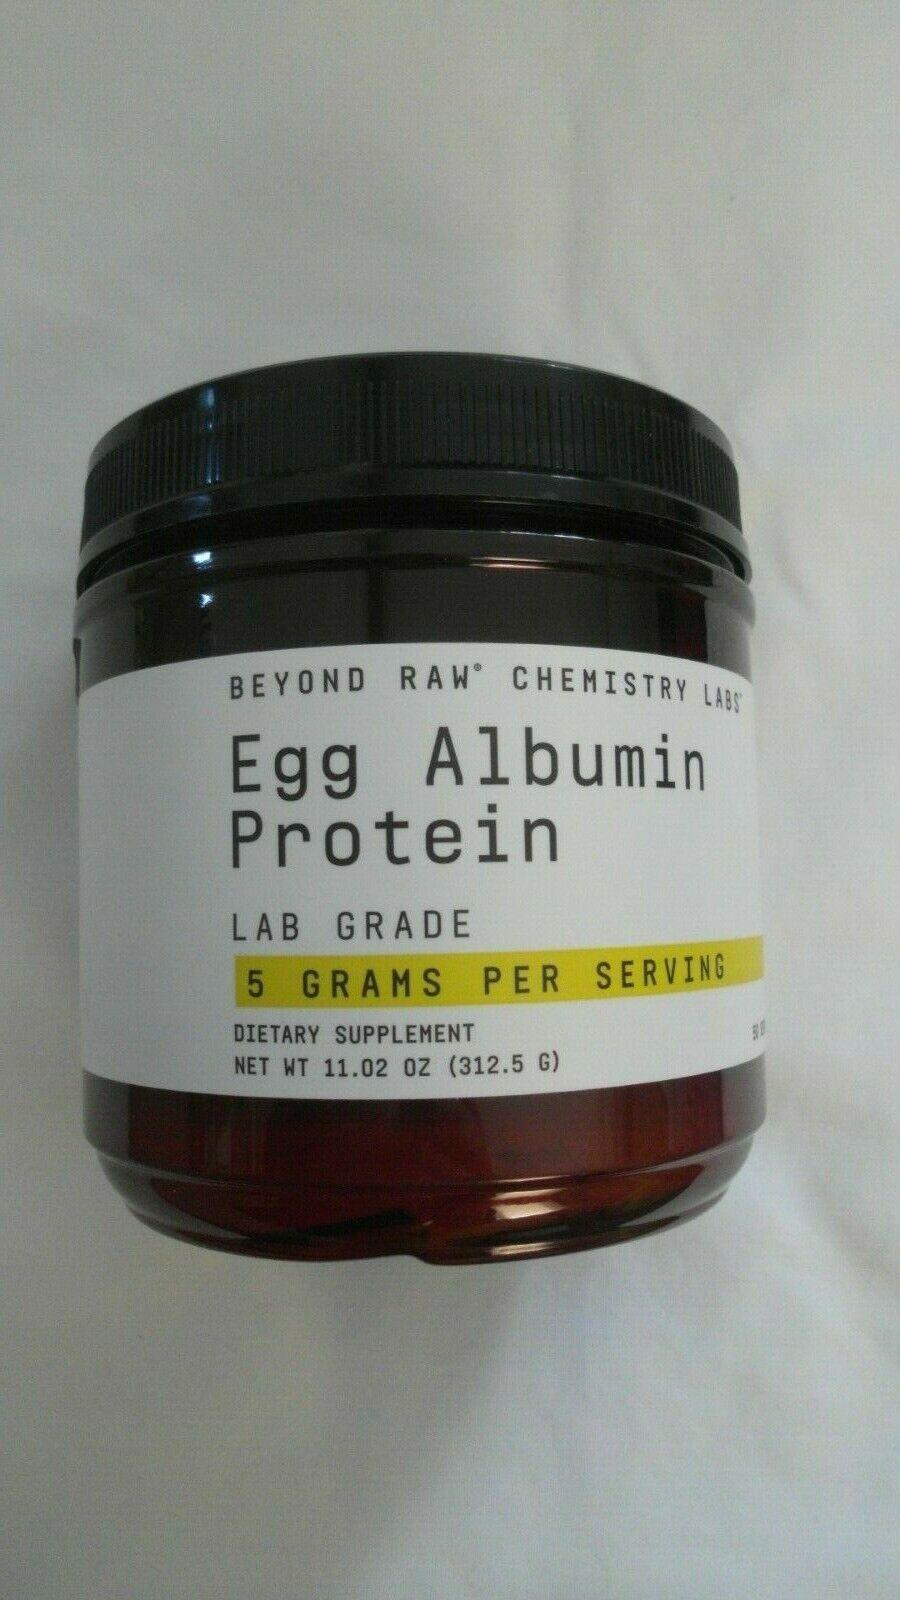 Beyond Raw Egg Albumin Protein Lab Grade 11.02 Oz 50 Servings